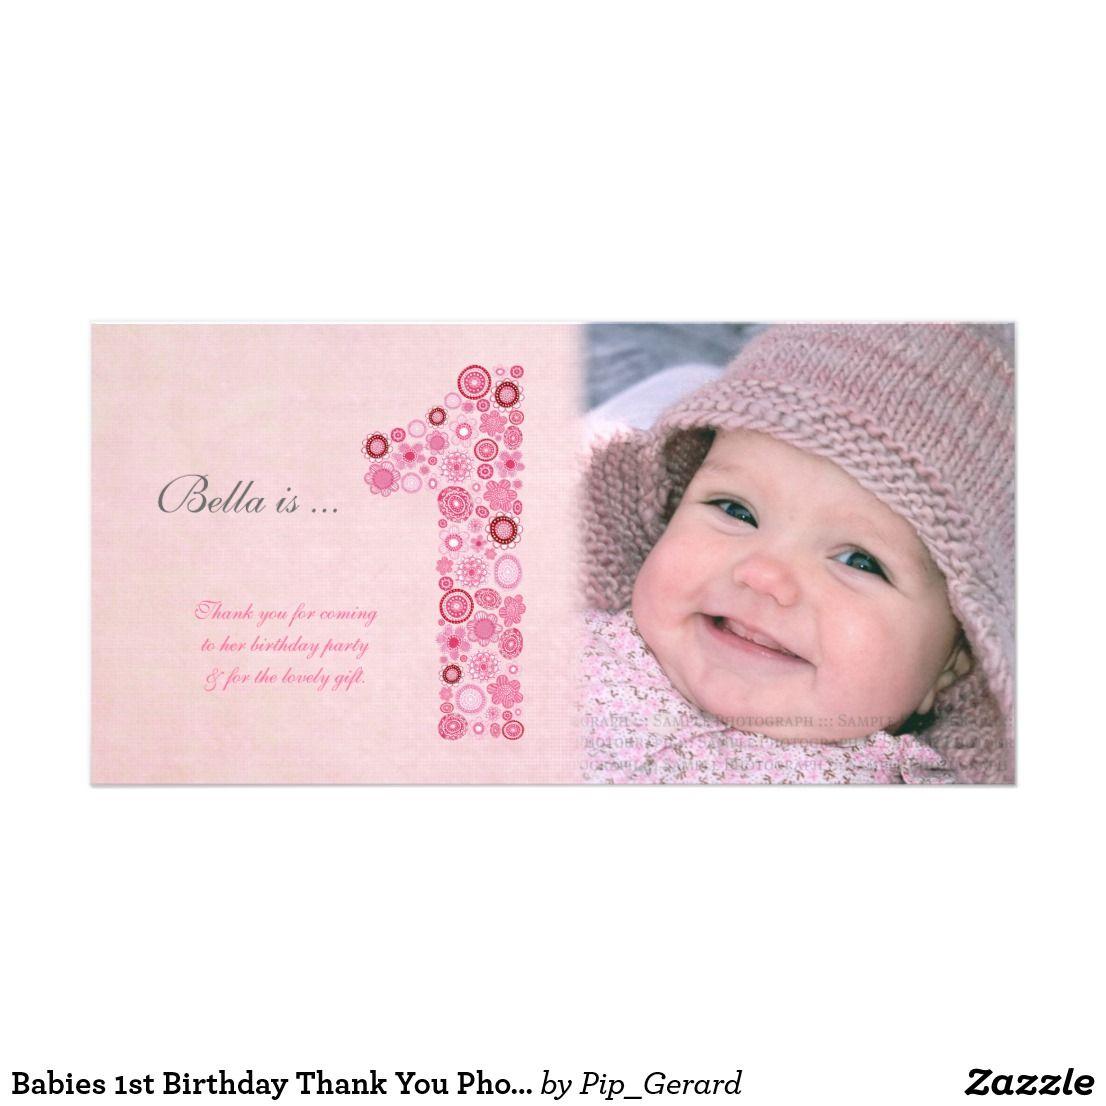 Babies 1st Birthday Thank You Photo Card Zazzle Com Birthday Thank You Baby 1st Birthday Thank You Photos